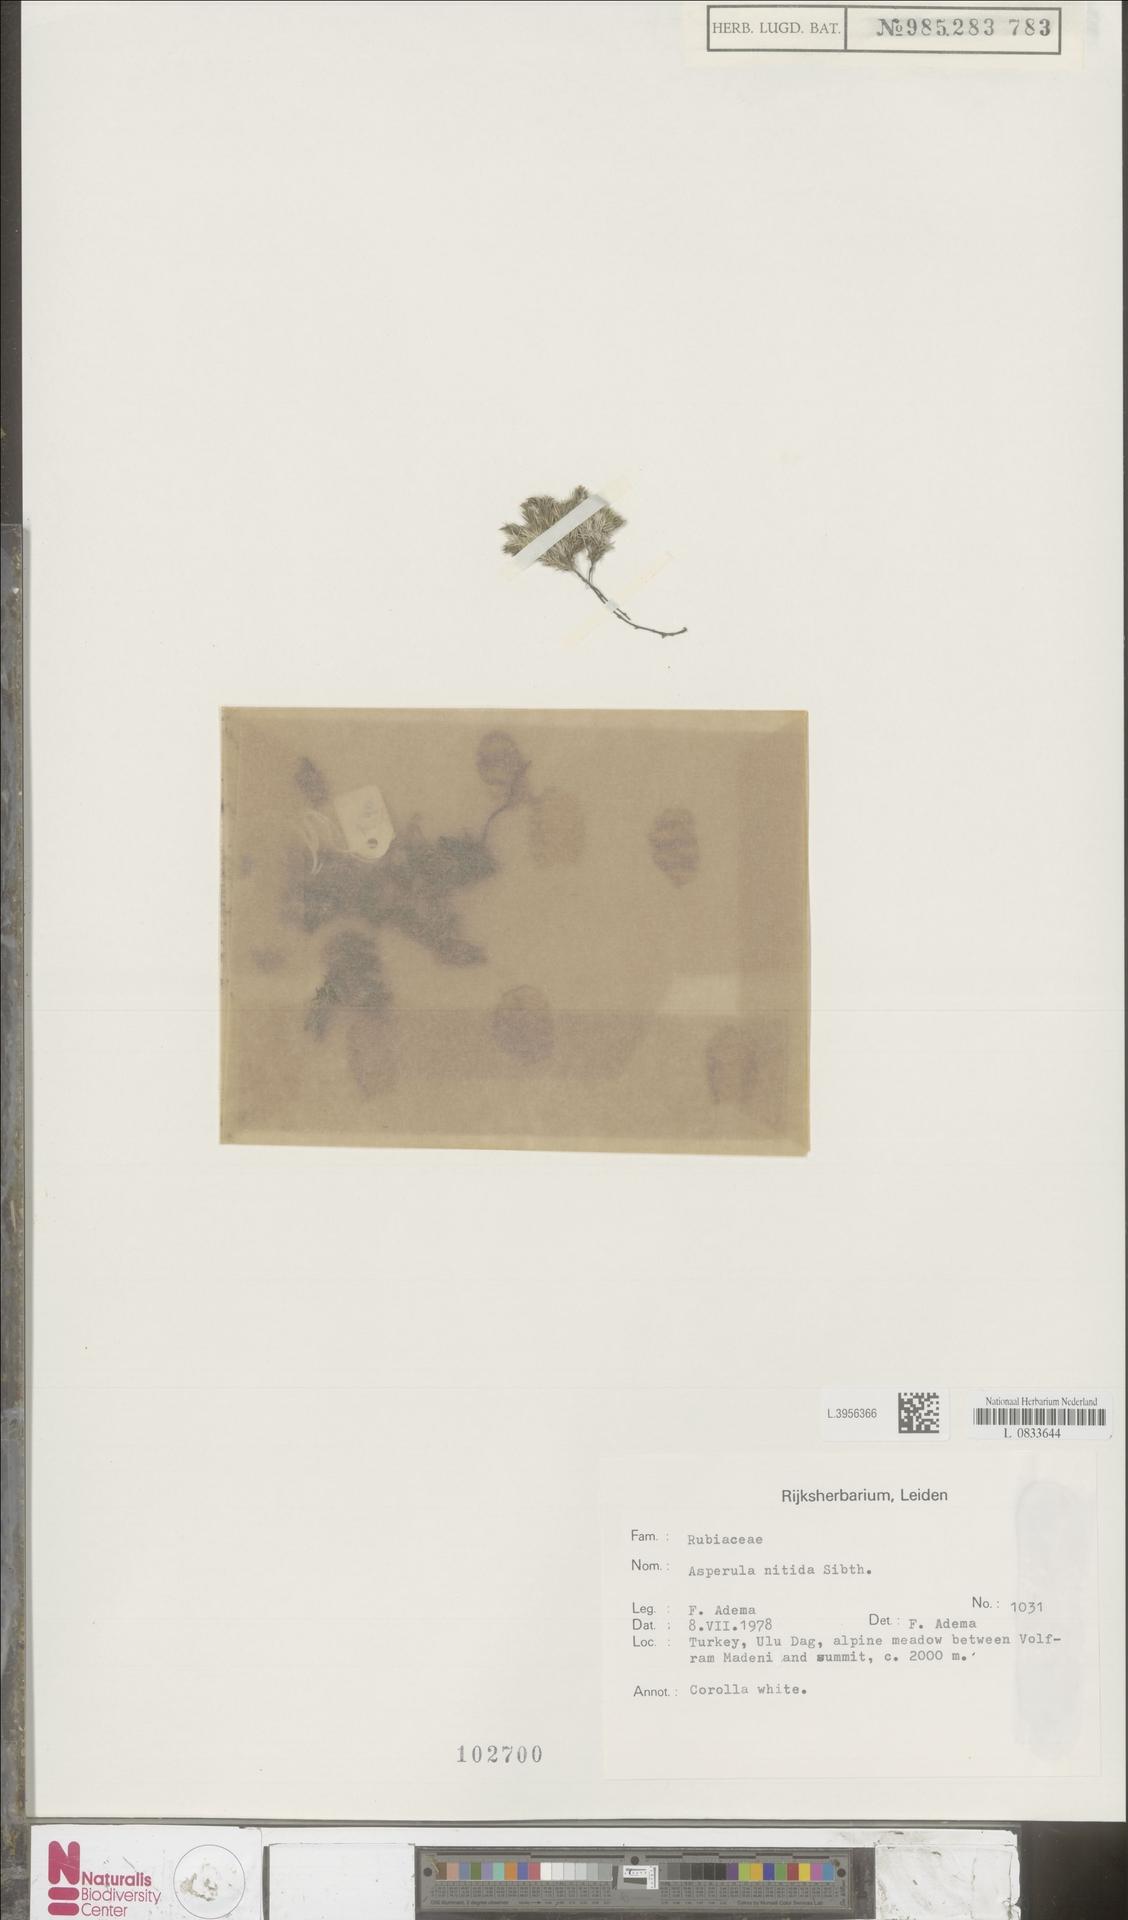 L.3956366 | Asperula nitida Sibth. & Sm.